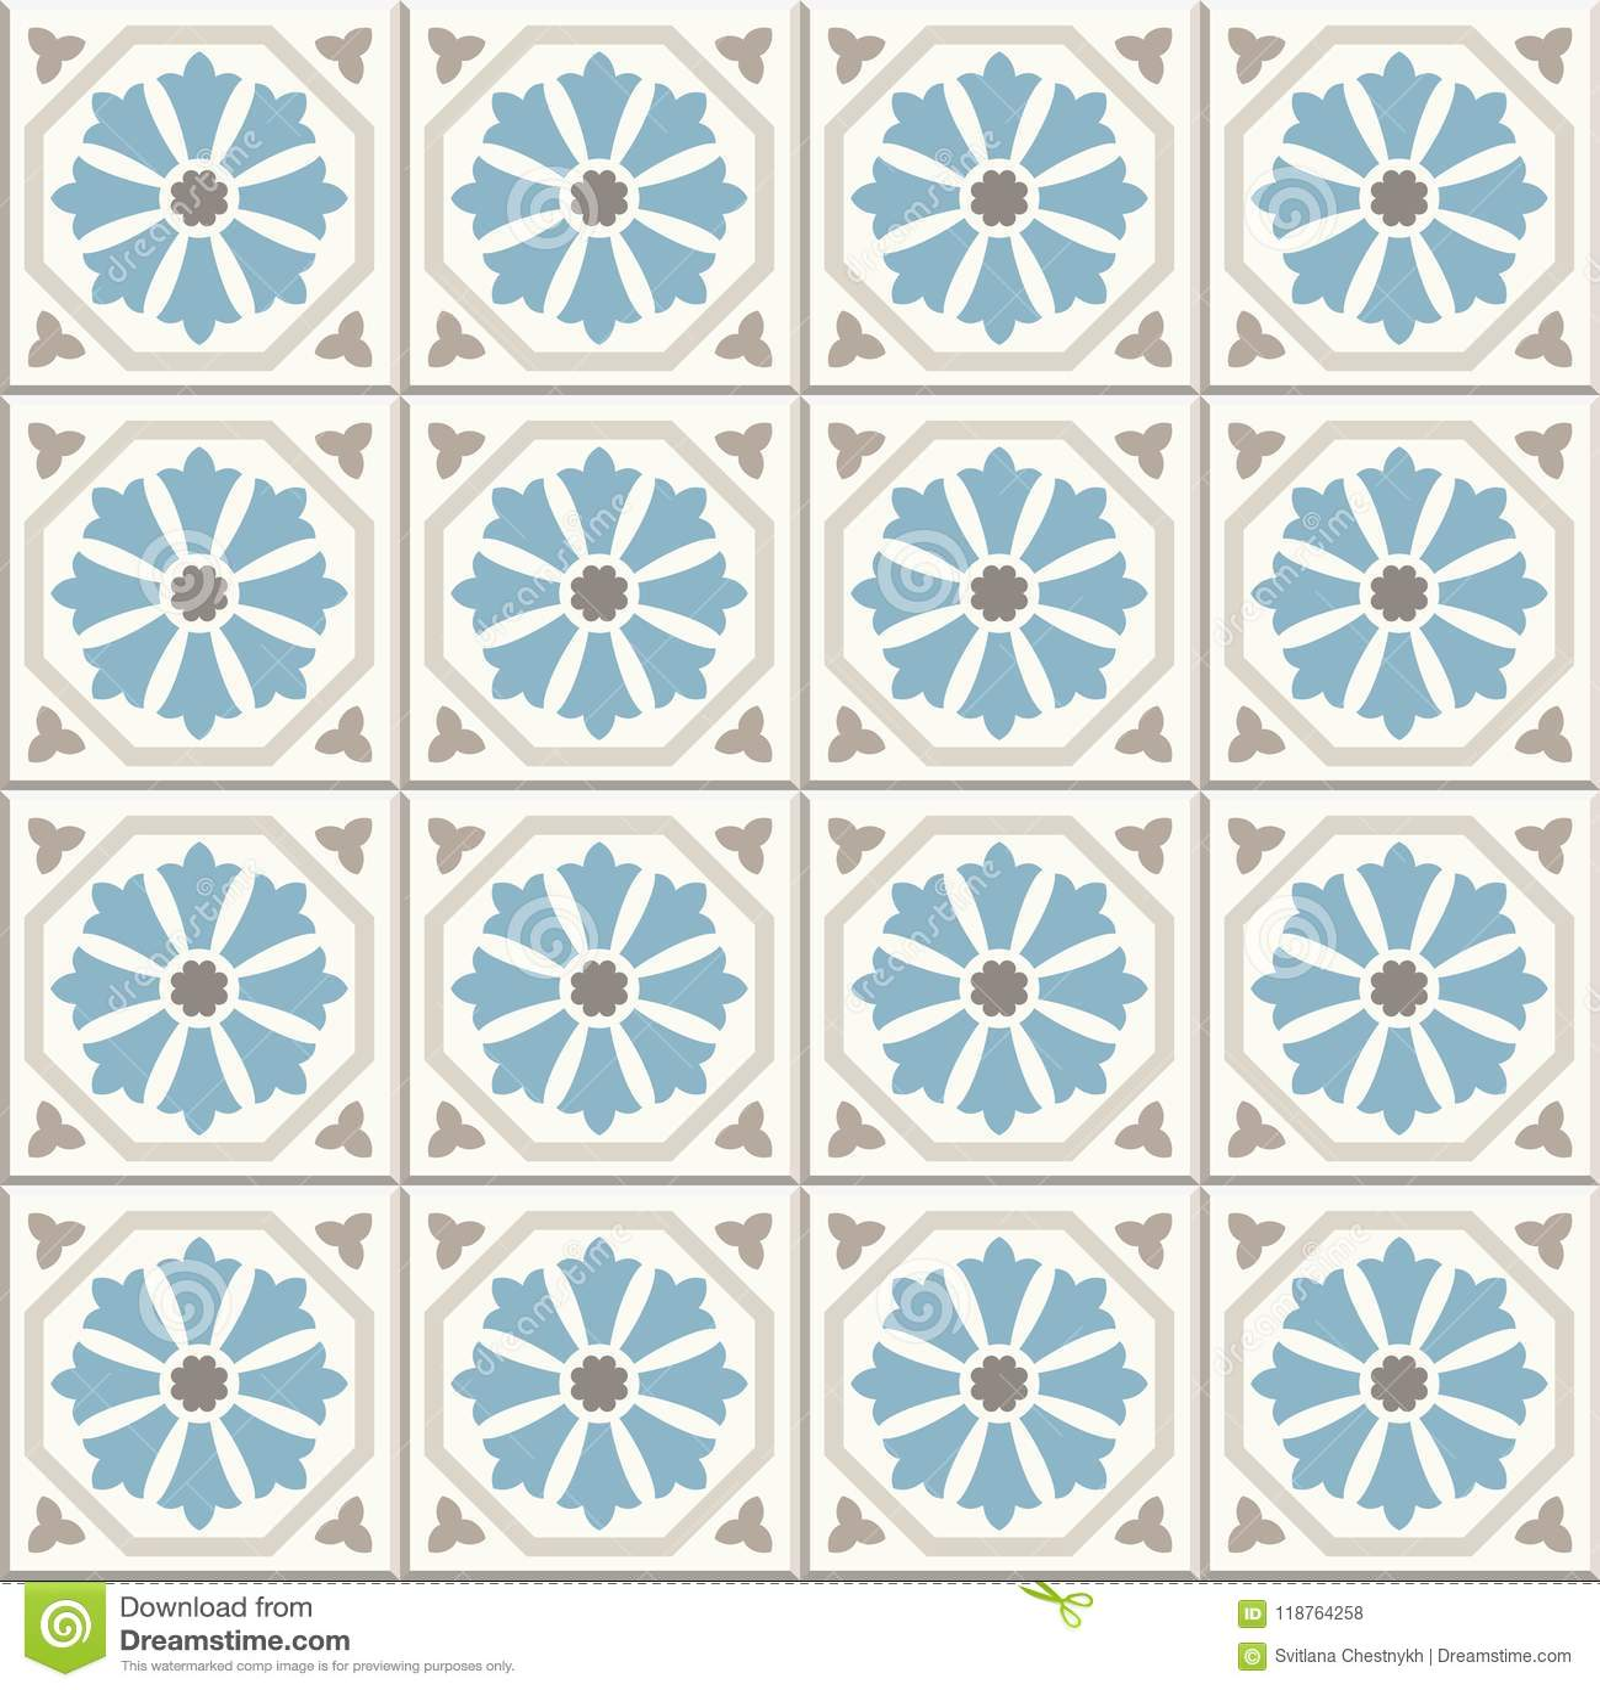 Ancient floor ceramic tiles. Victorian English floor tiling design, seamless vector pattern